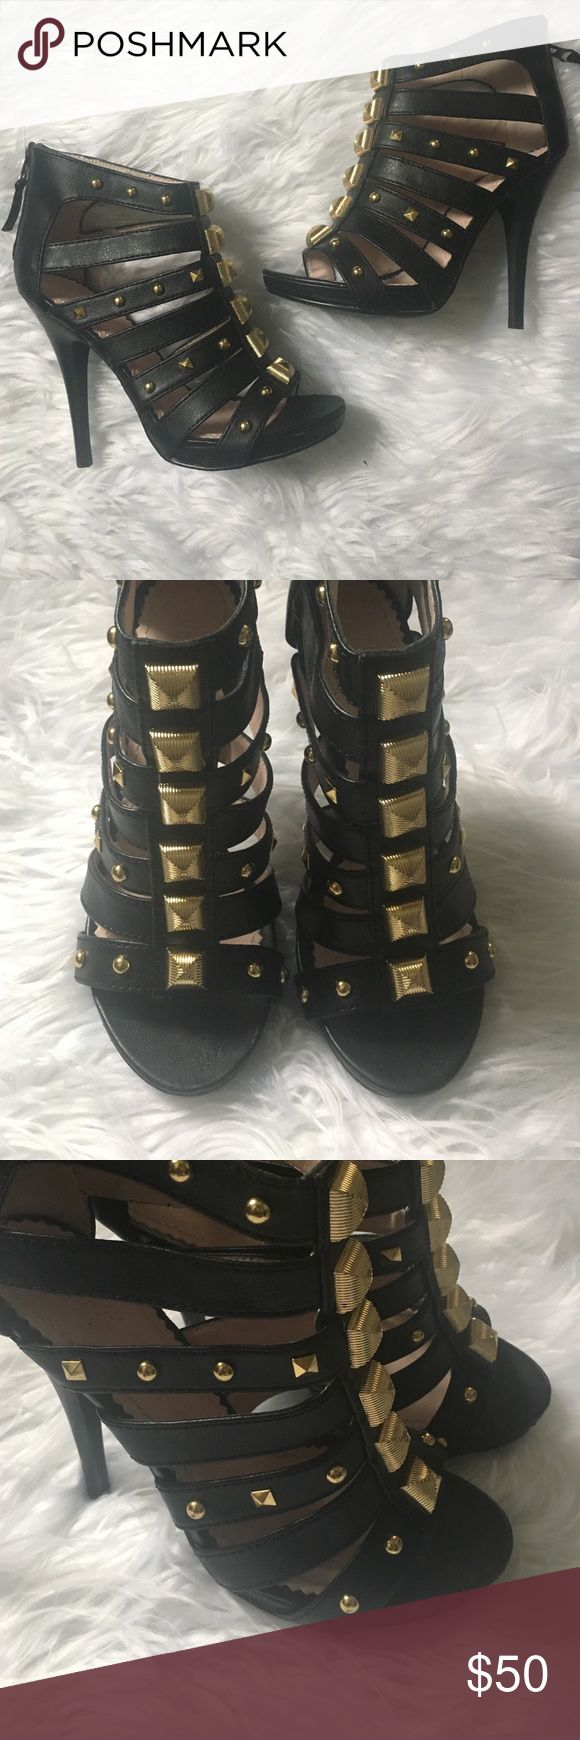 Colin Stuart Black Heels with Gold Hardware Size 6 Colin Stuart Shoes Heels